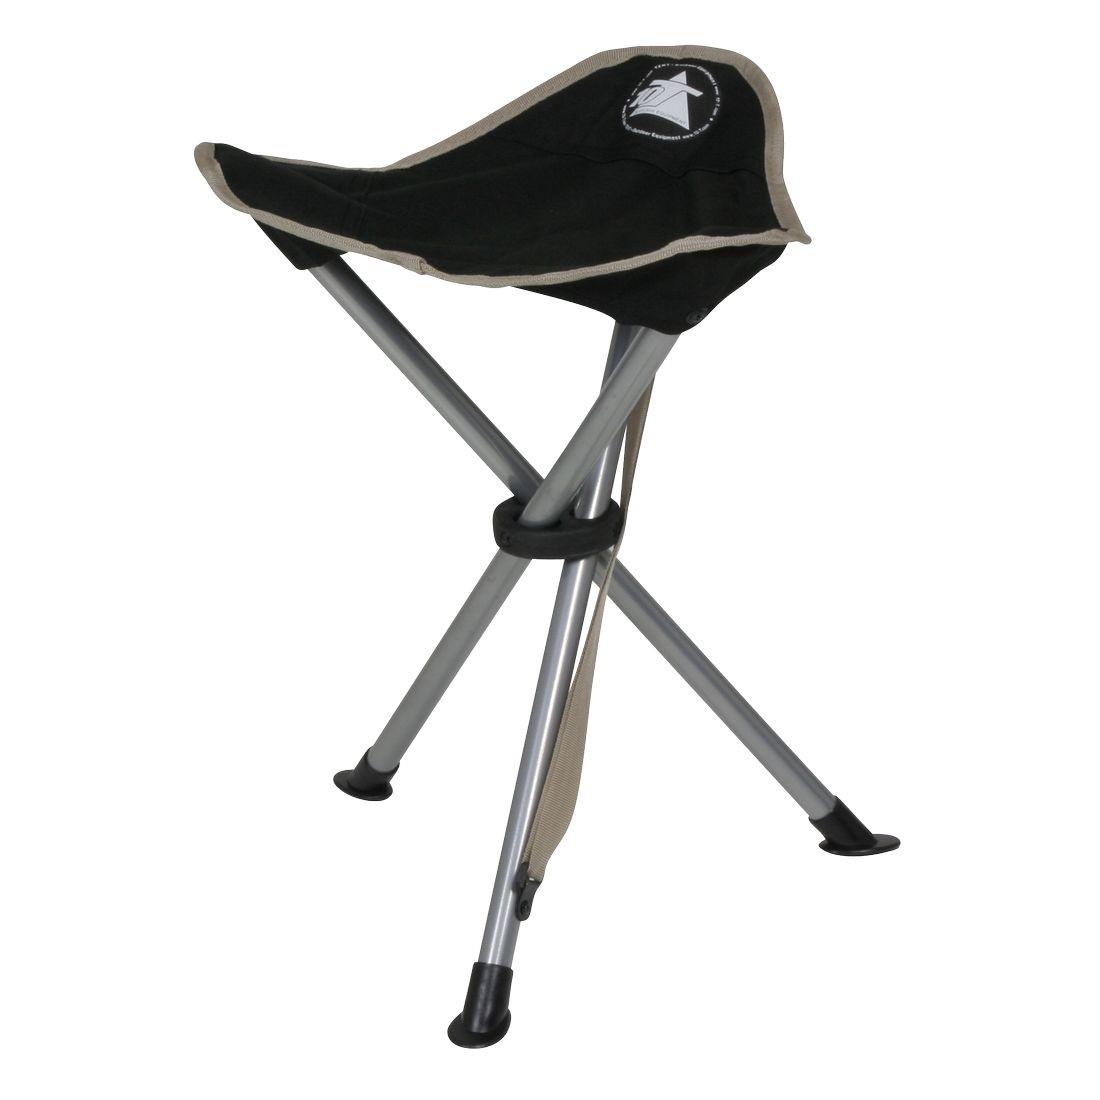 Buy 10t Tripod Camping Chair Three Leg Stool 45 Cm Seat Height